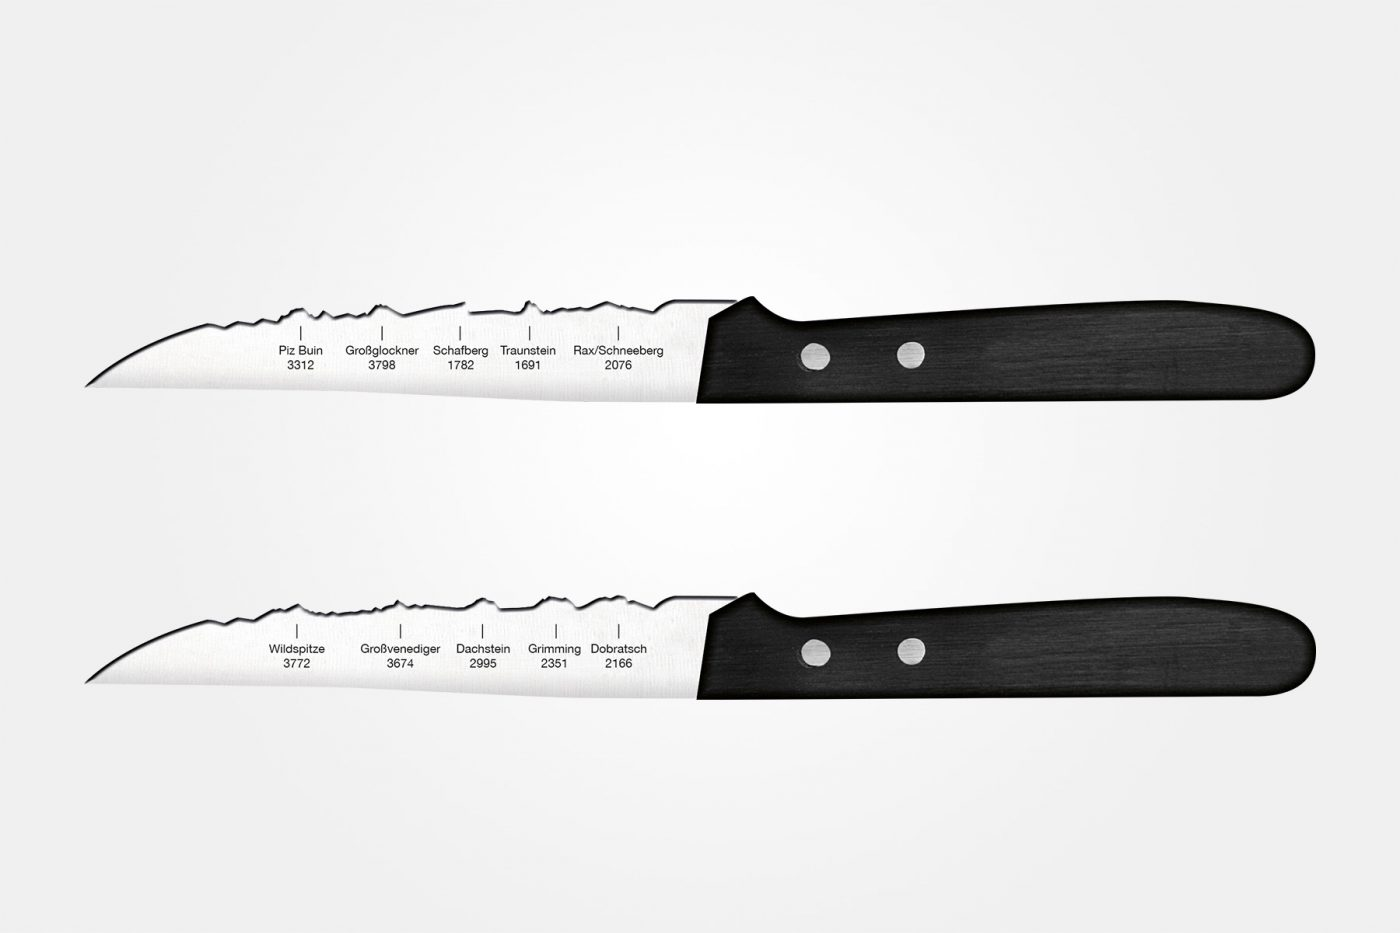 BOA_Steakmesser01